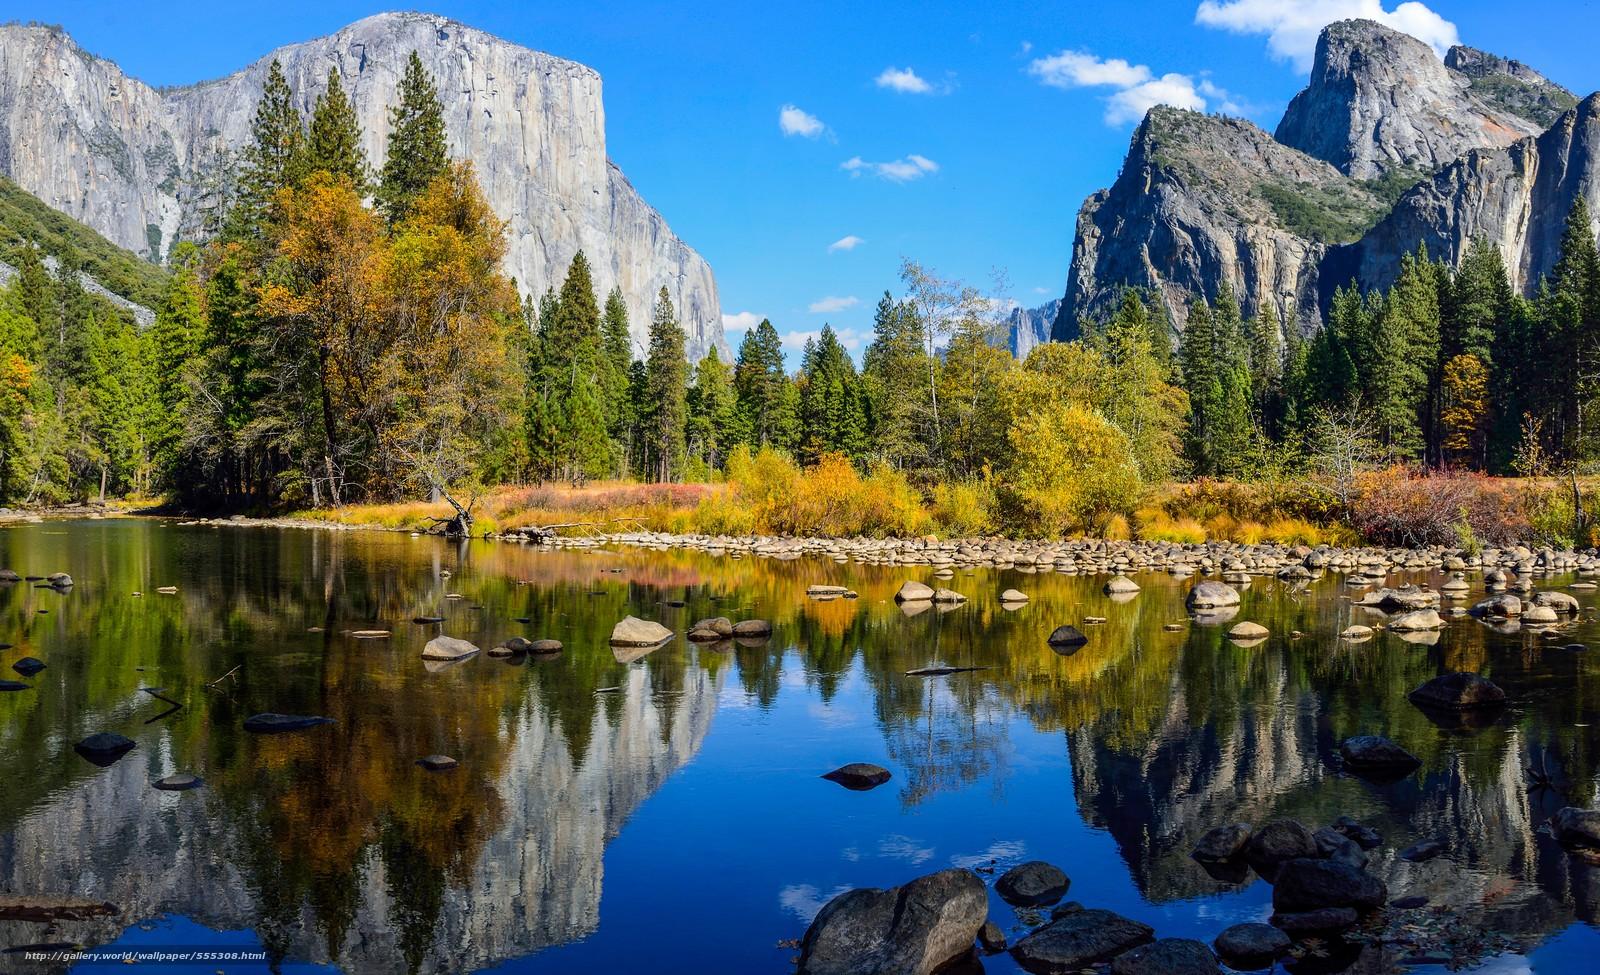 wallpaper Yosemite National Park river Mountains Rocks desktop 1600x975